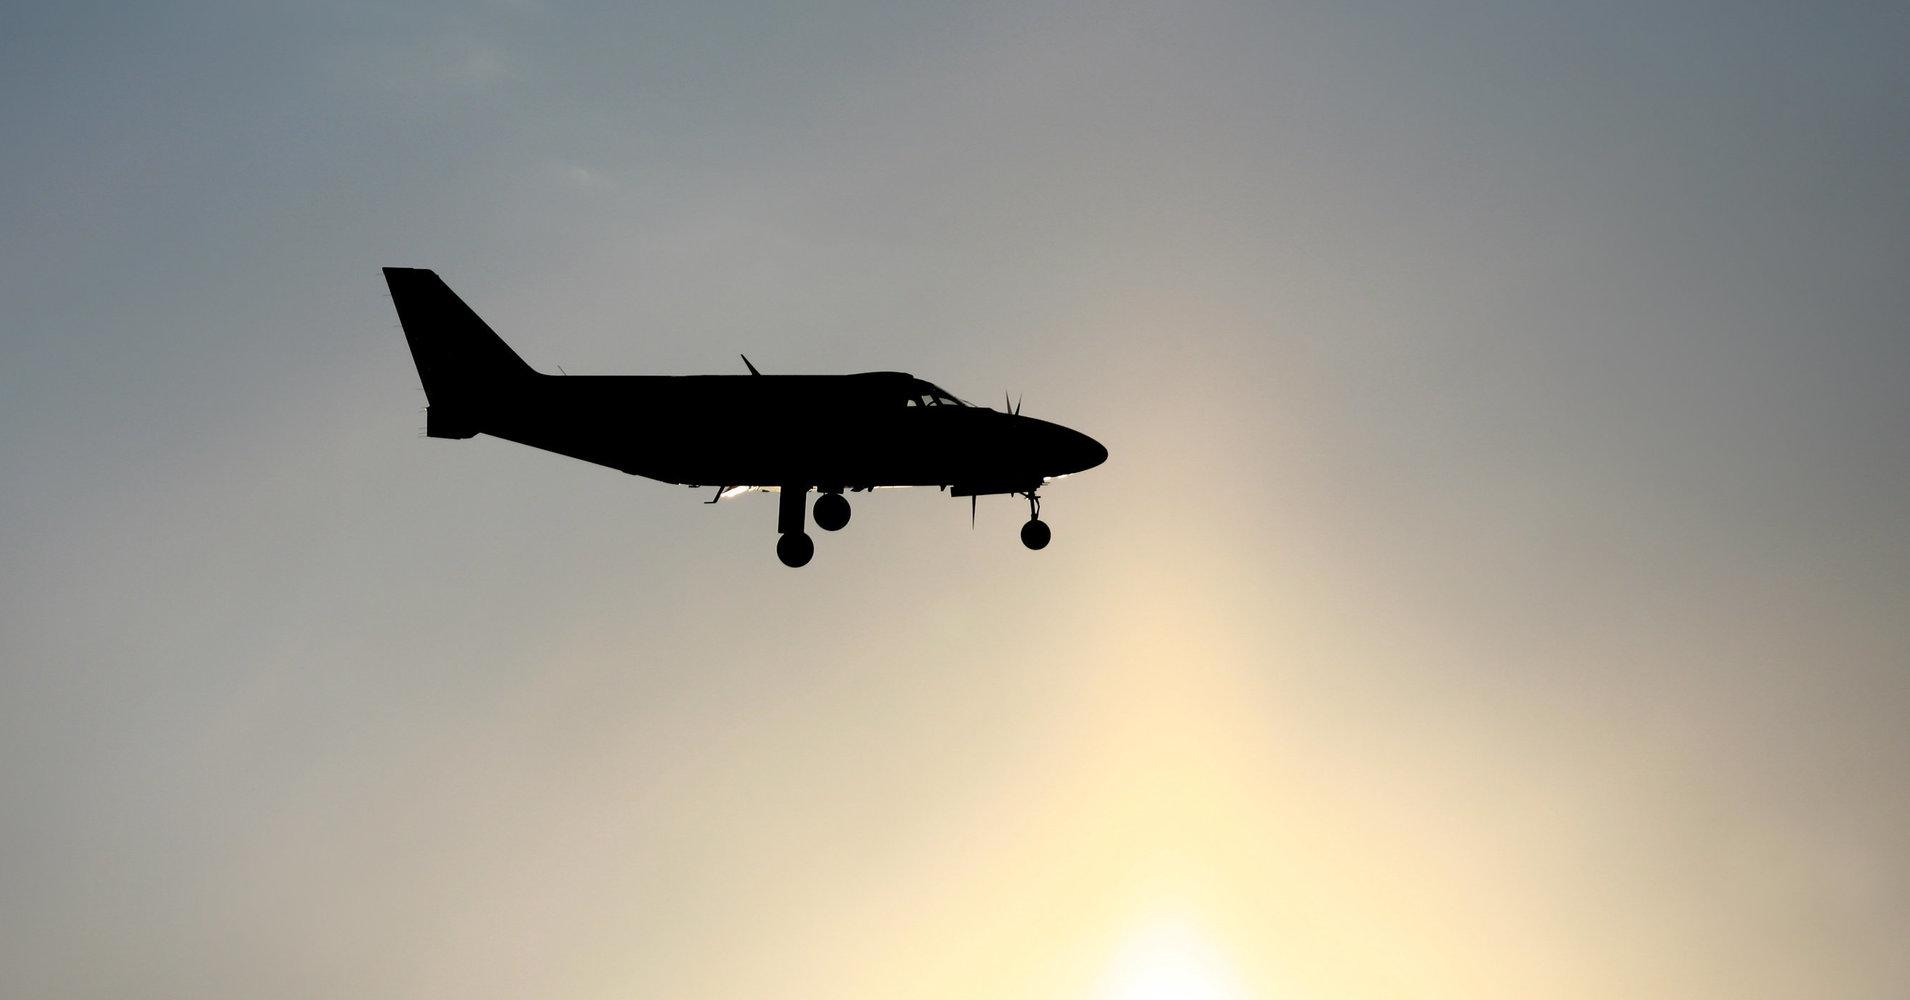 Sleeping Vortex Air Pilot Misses Australian Island Destination